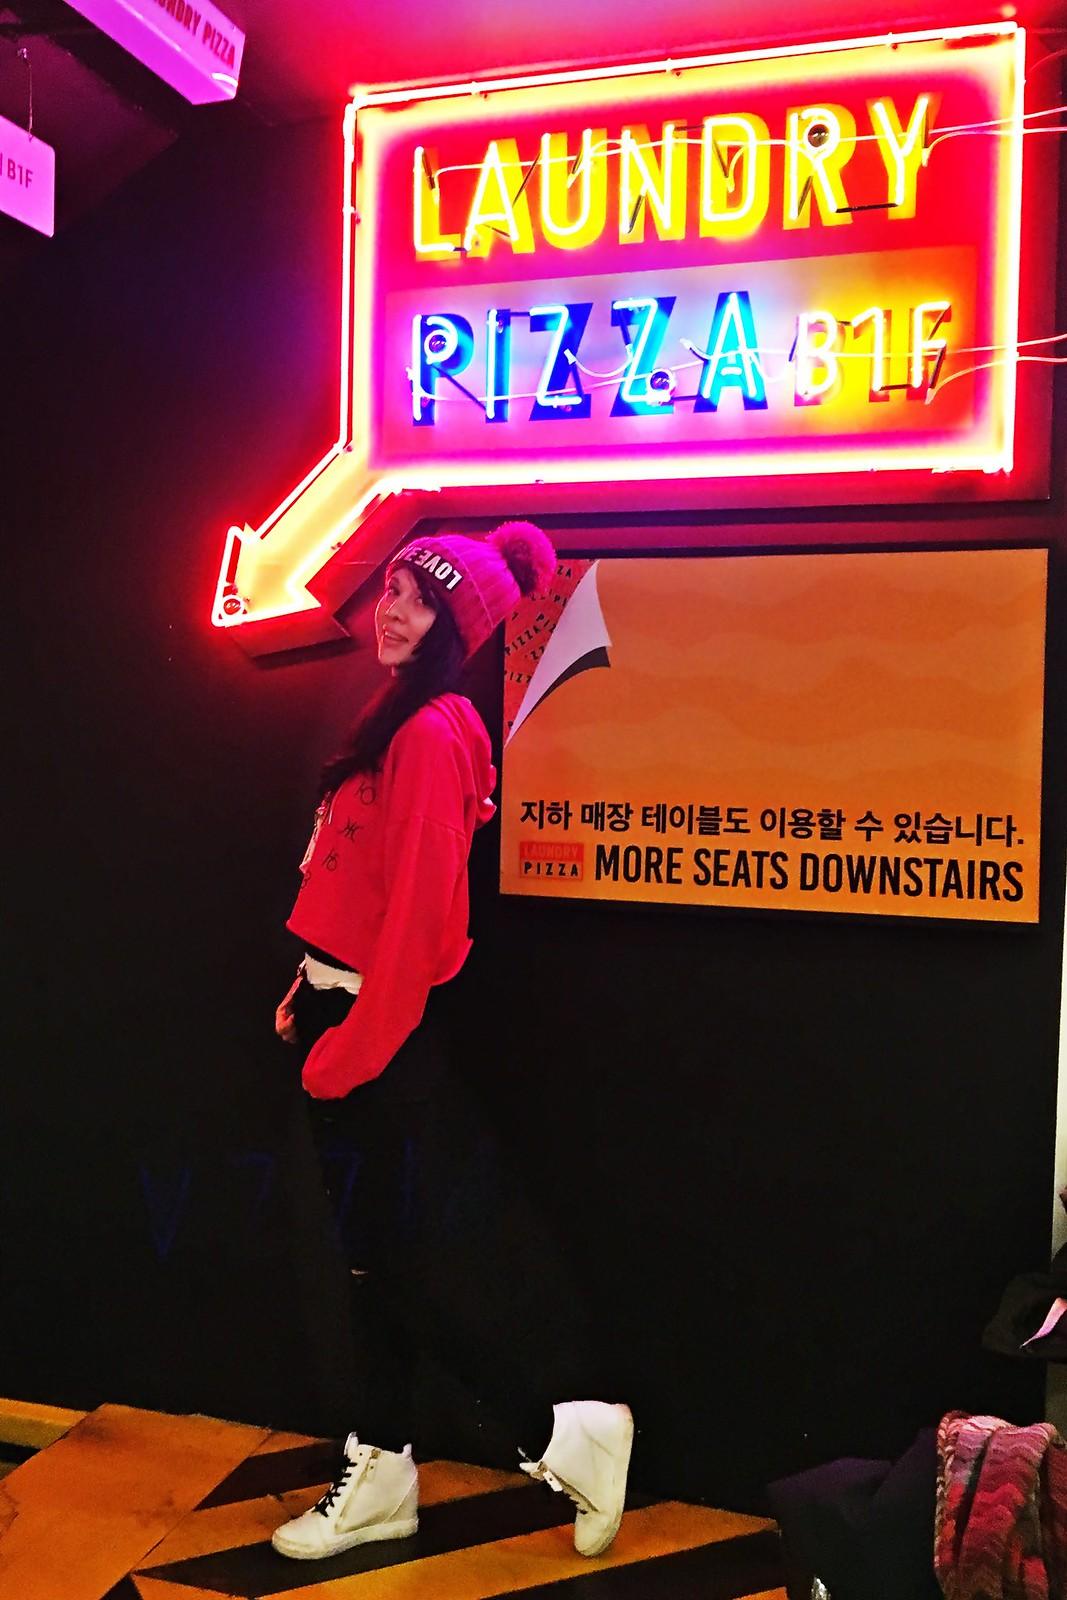 Laundry Pizza & Double Trouble - Gangnam - Seoul